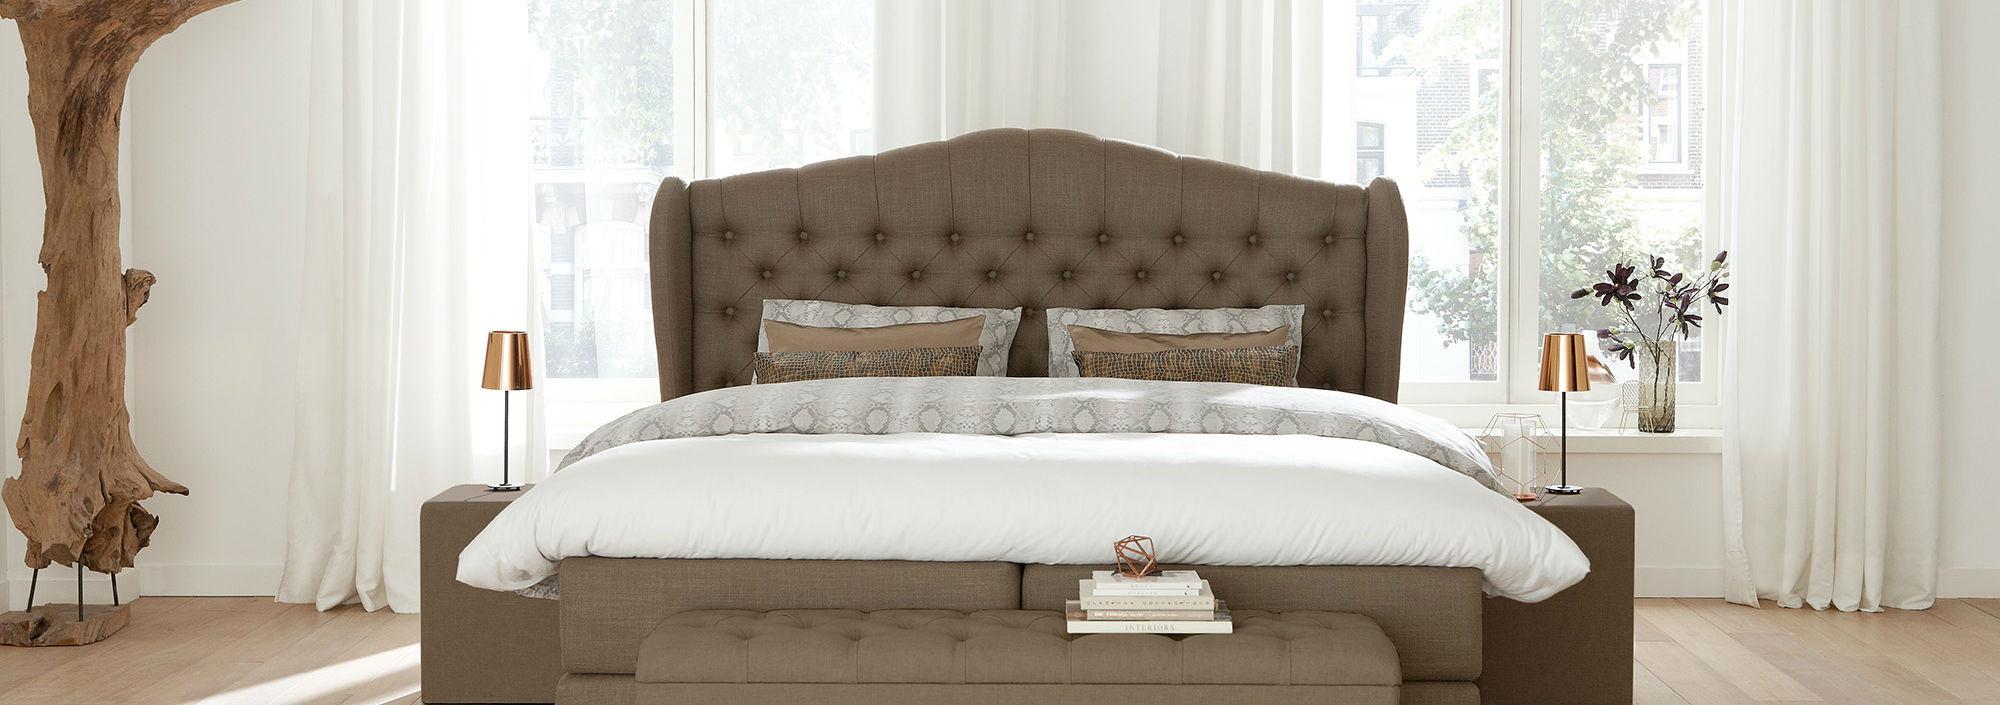 Swiss Betten  Kingsize Bett Kaufen Swiss Sense